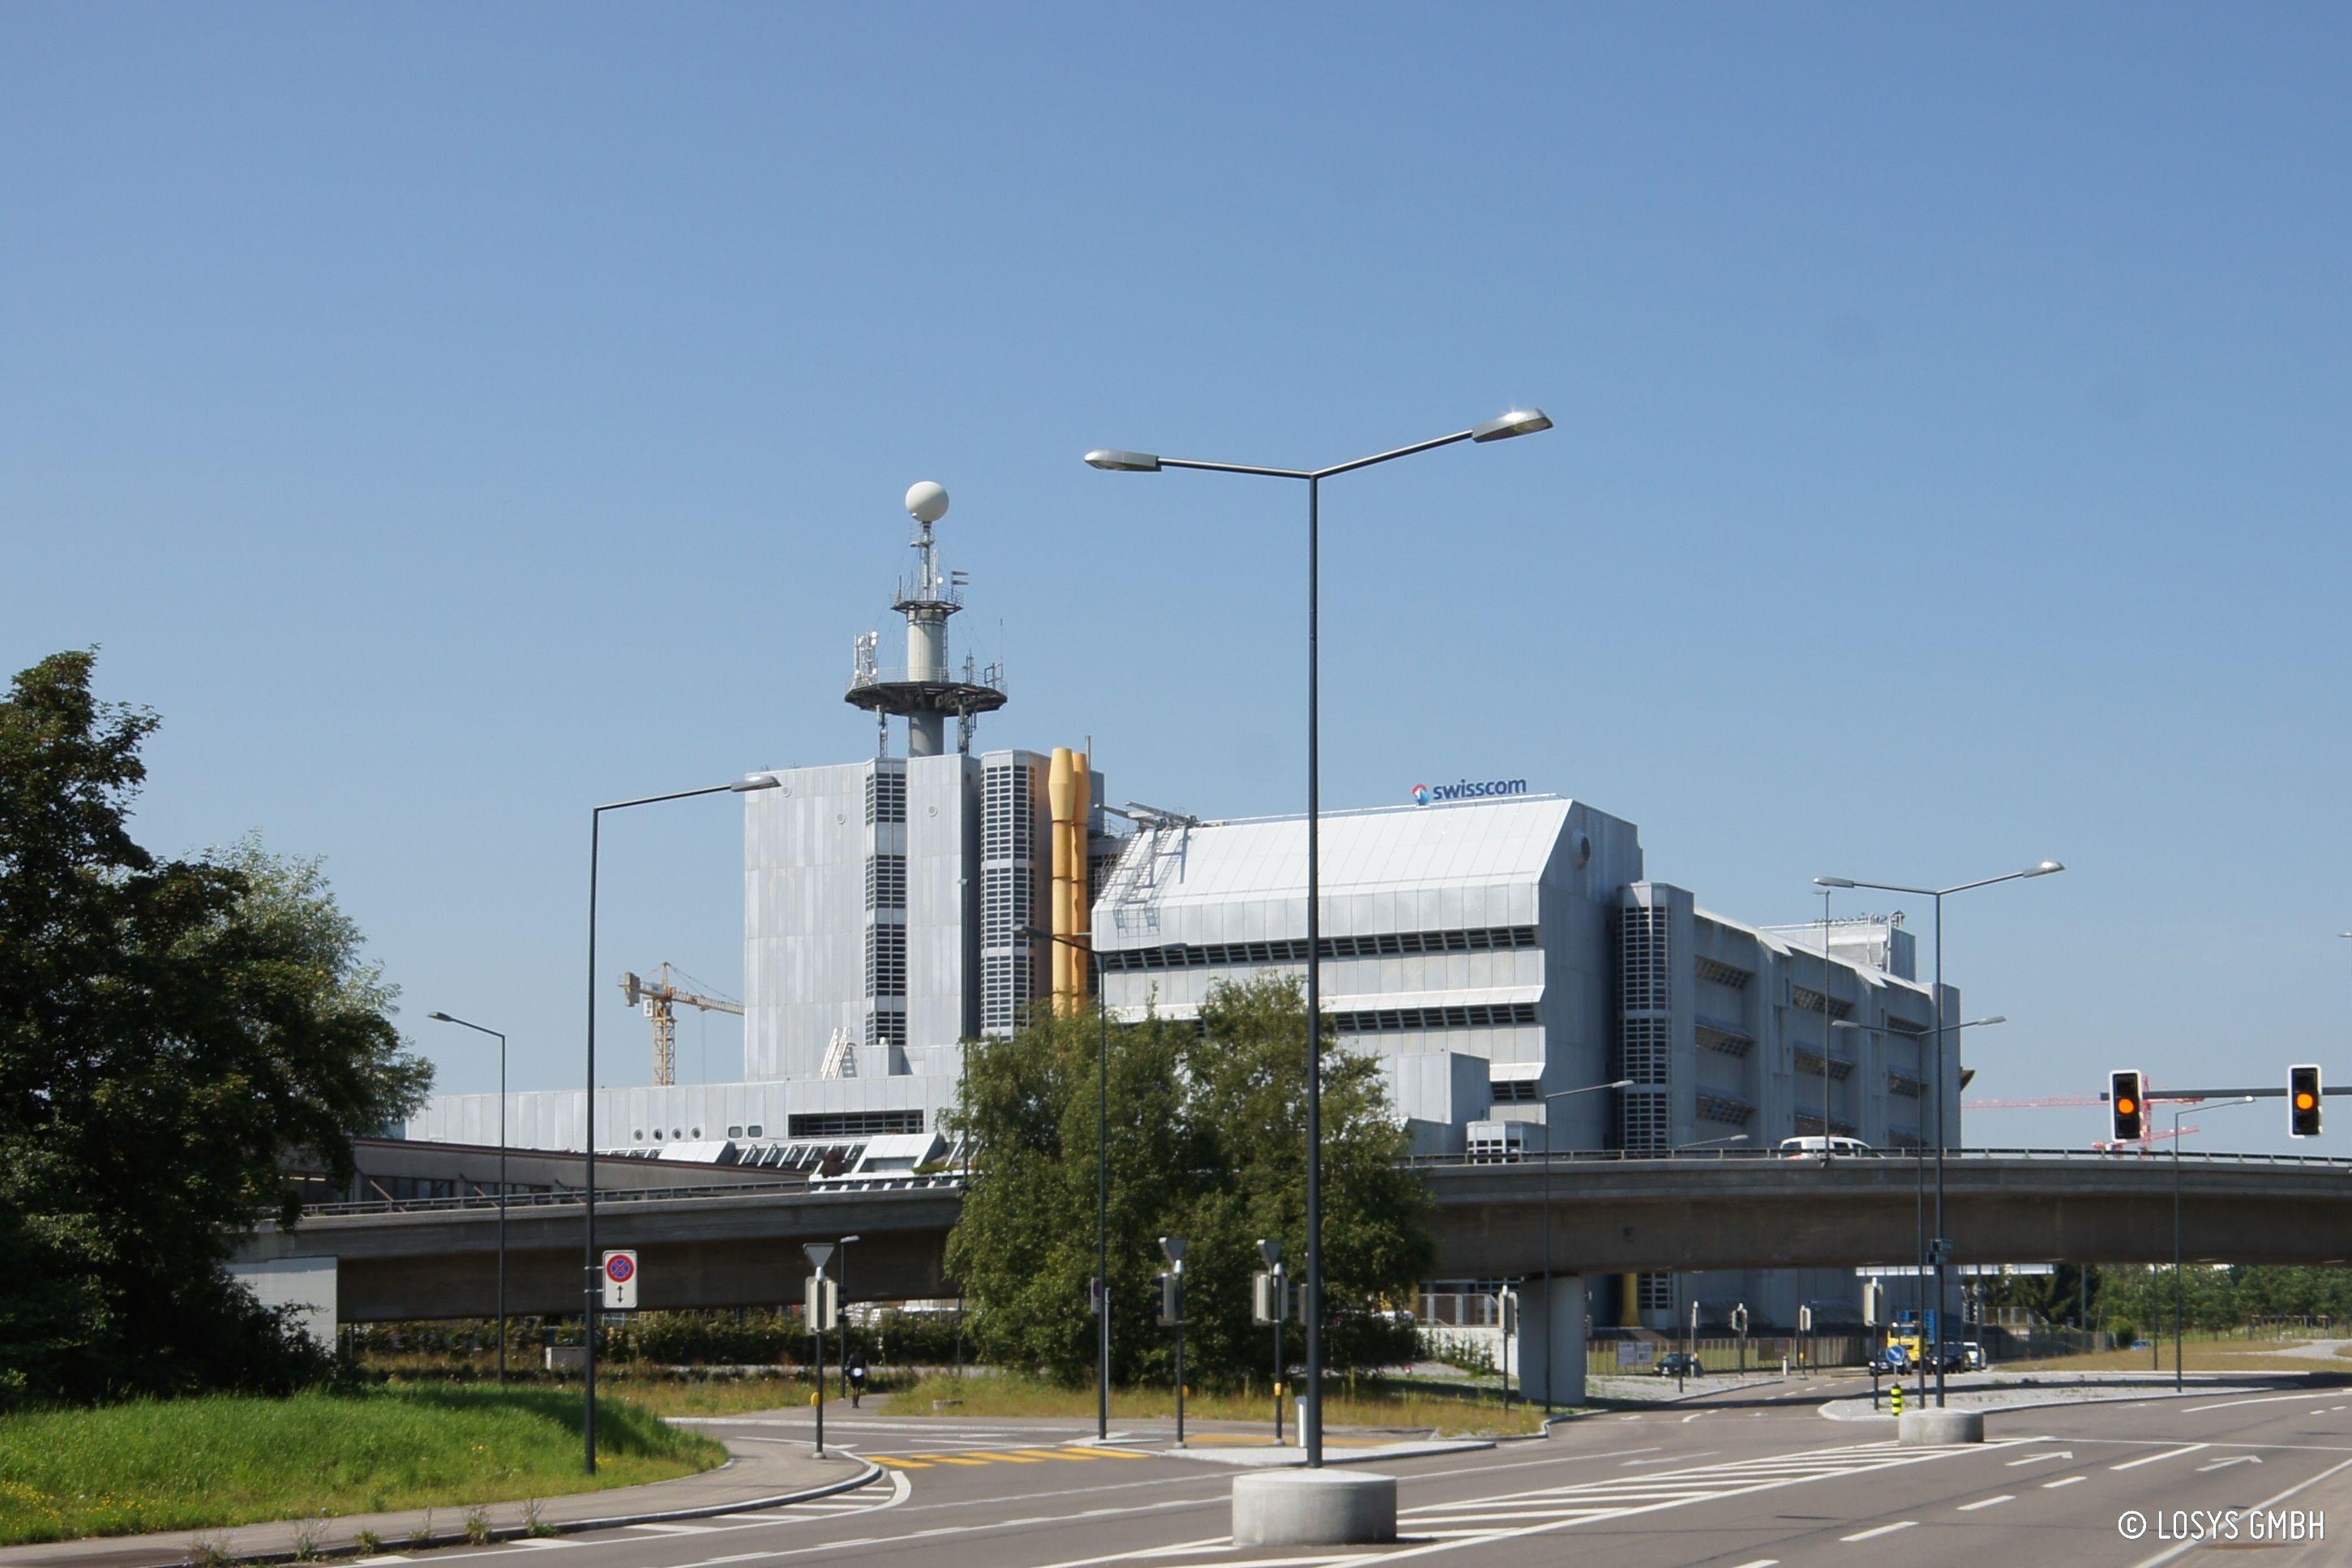 Rechenzentrum Swisscom Herdern